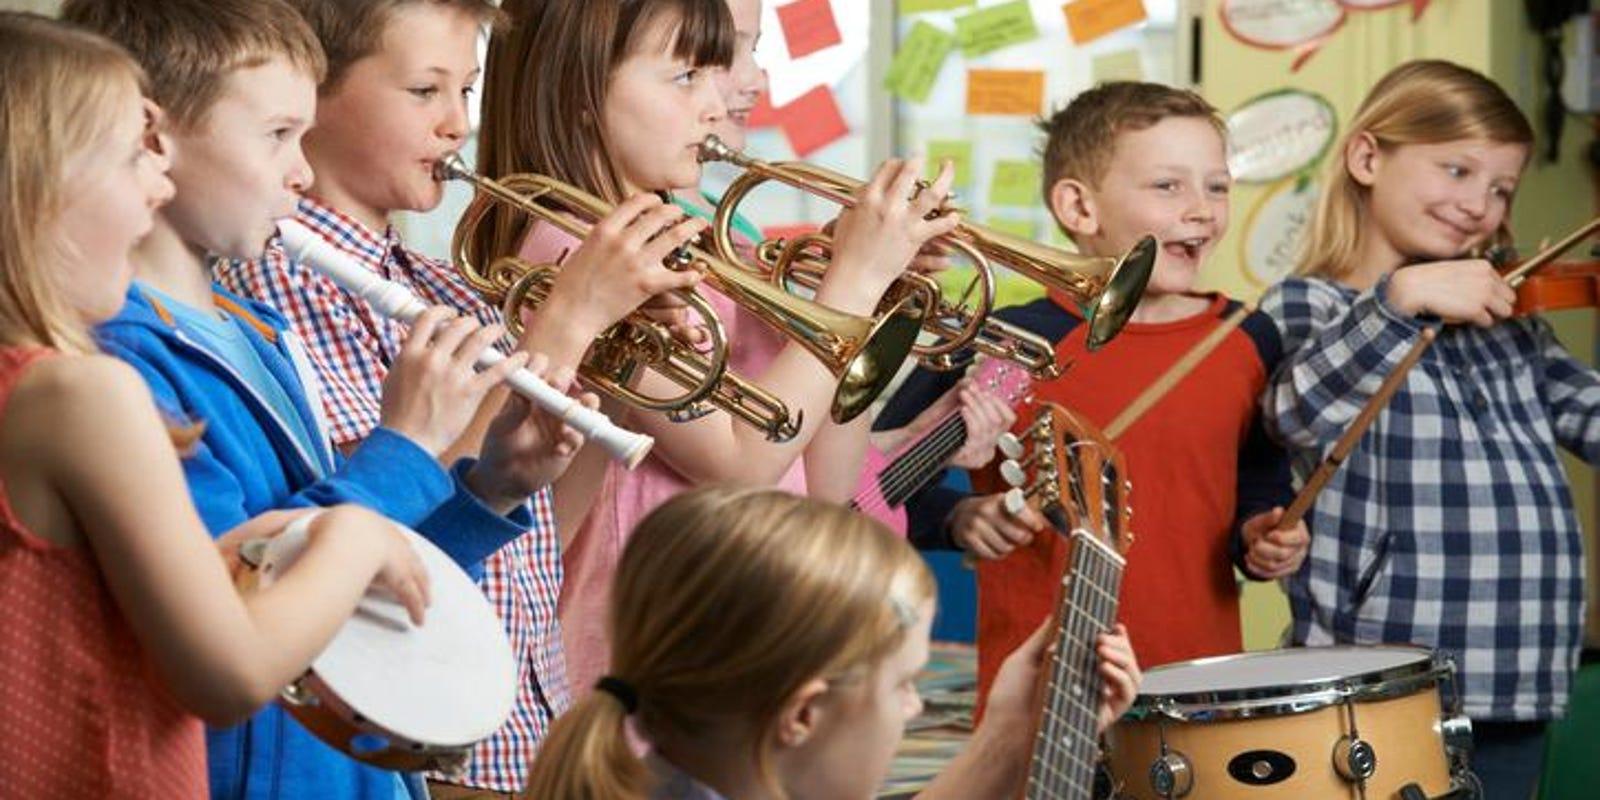 child childrens music school - 1100×660